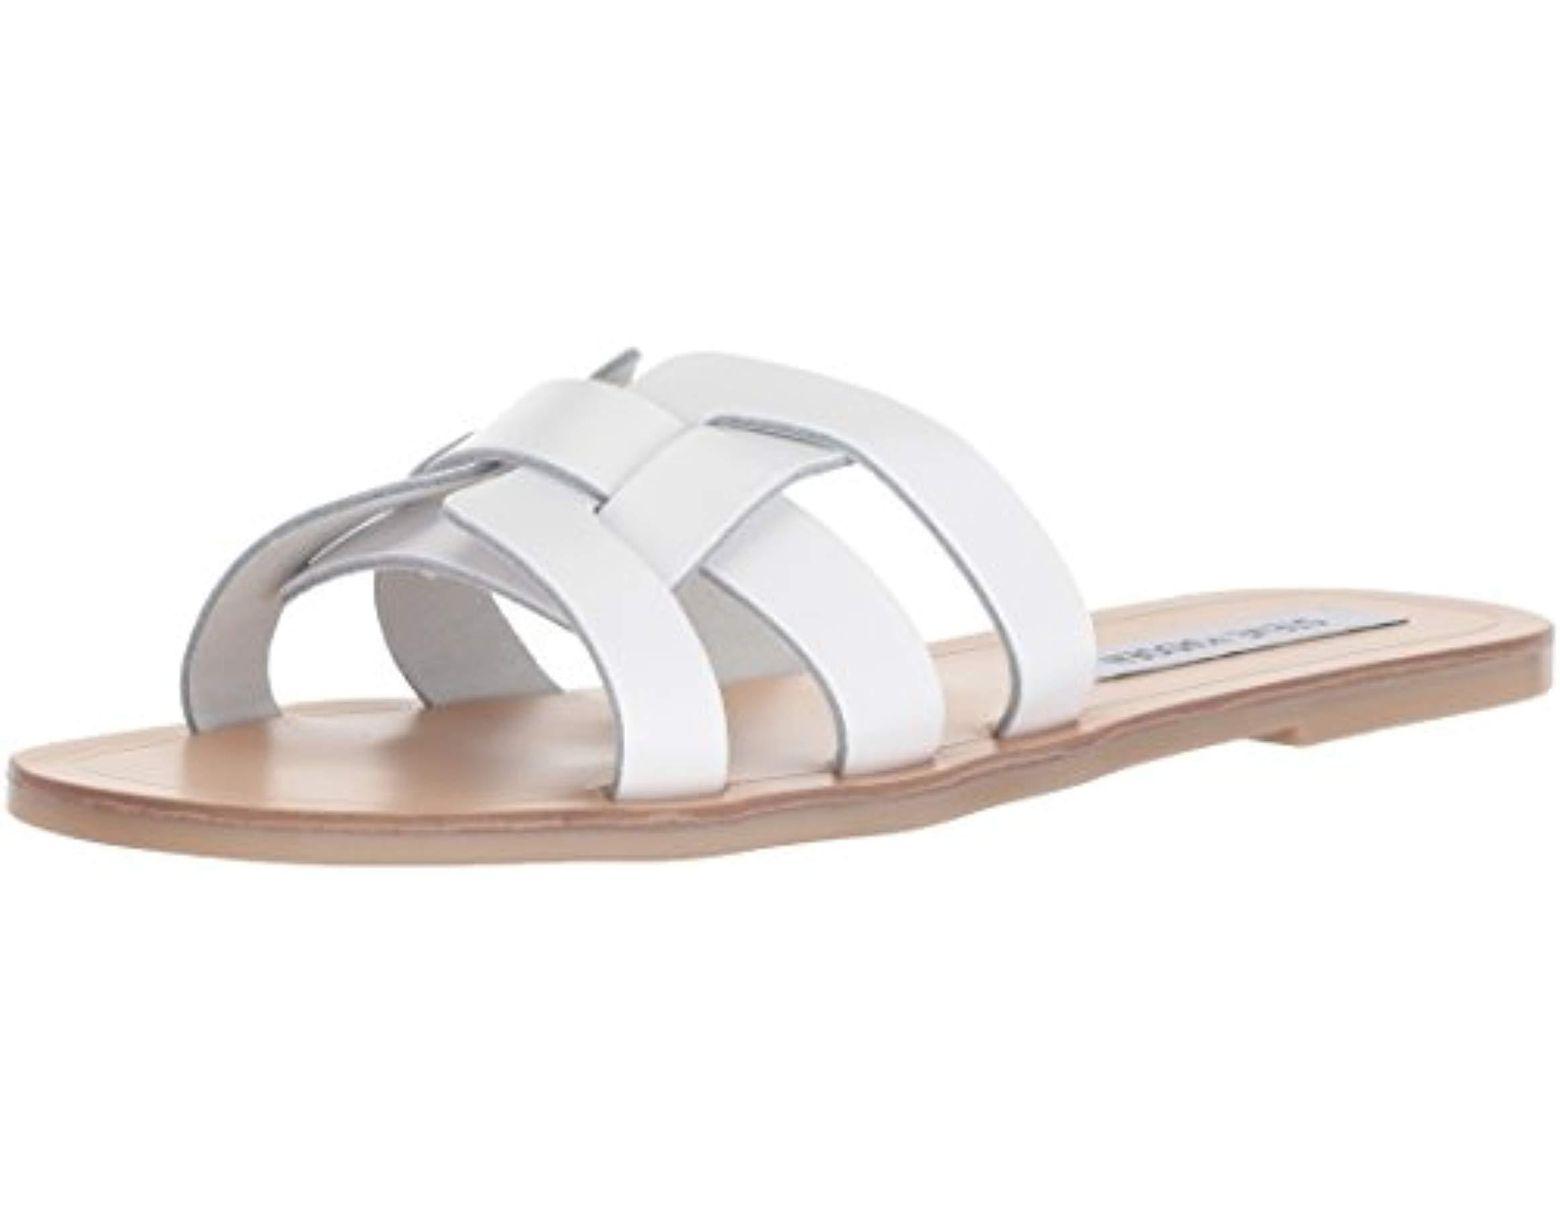 5c31e68e580 Women's White Sicily Sandal